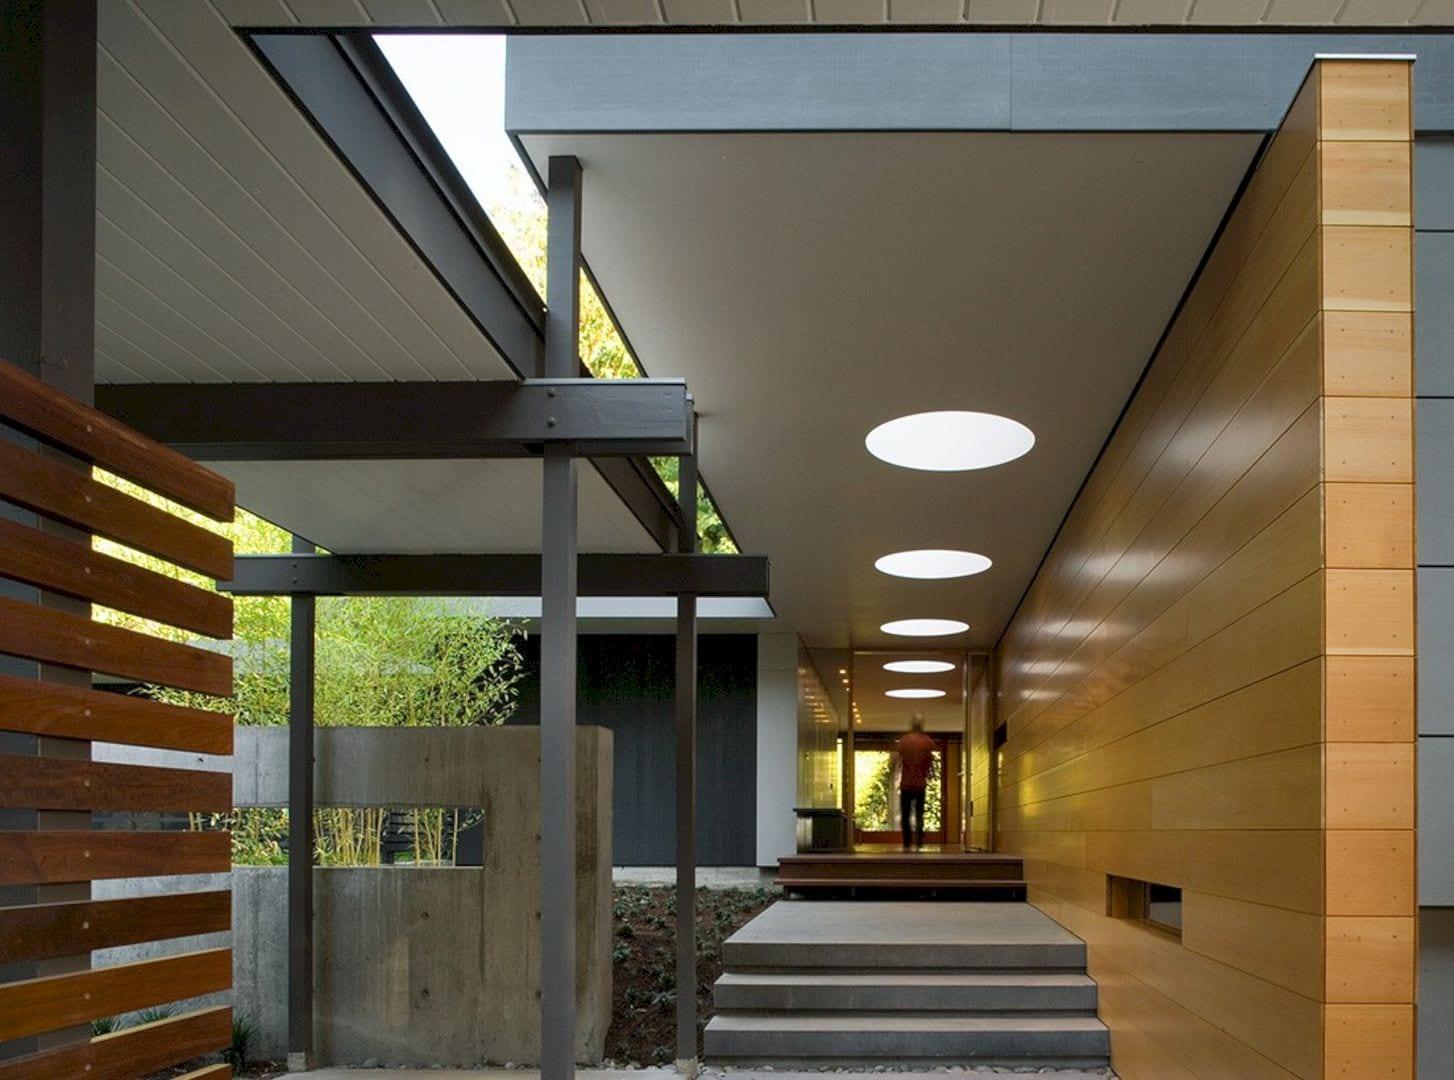 Woodway Residence By Bohlin Cywinski Jackson 3